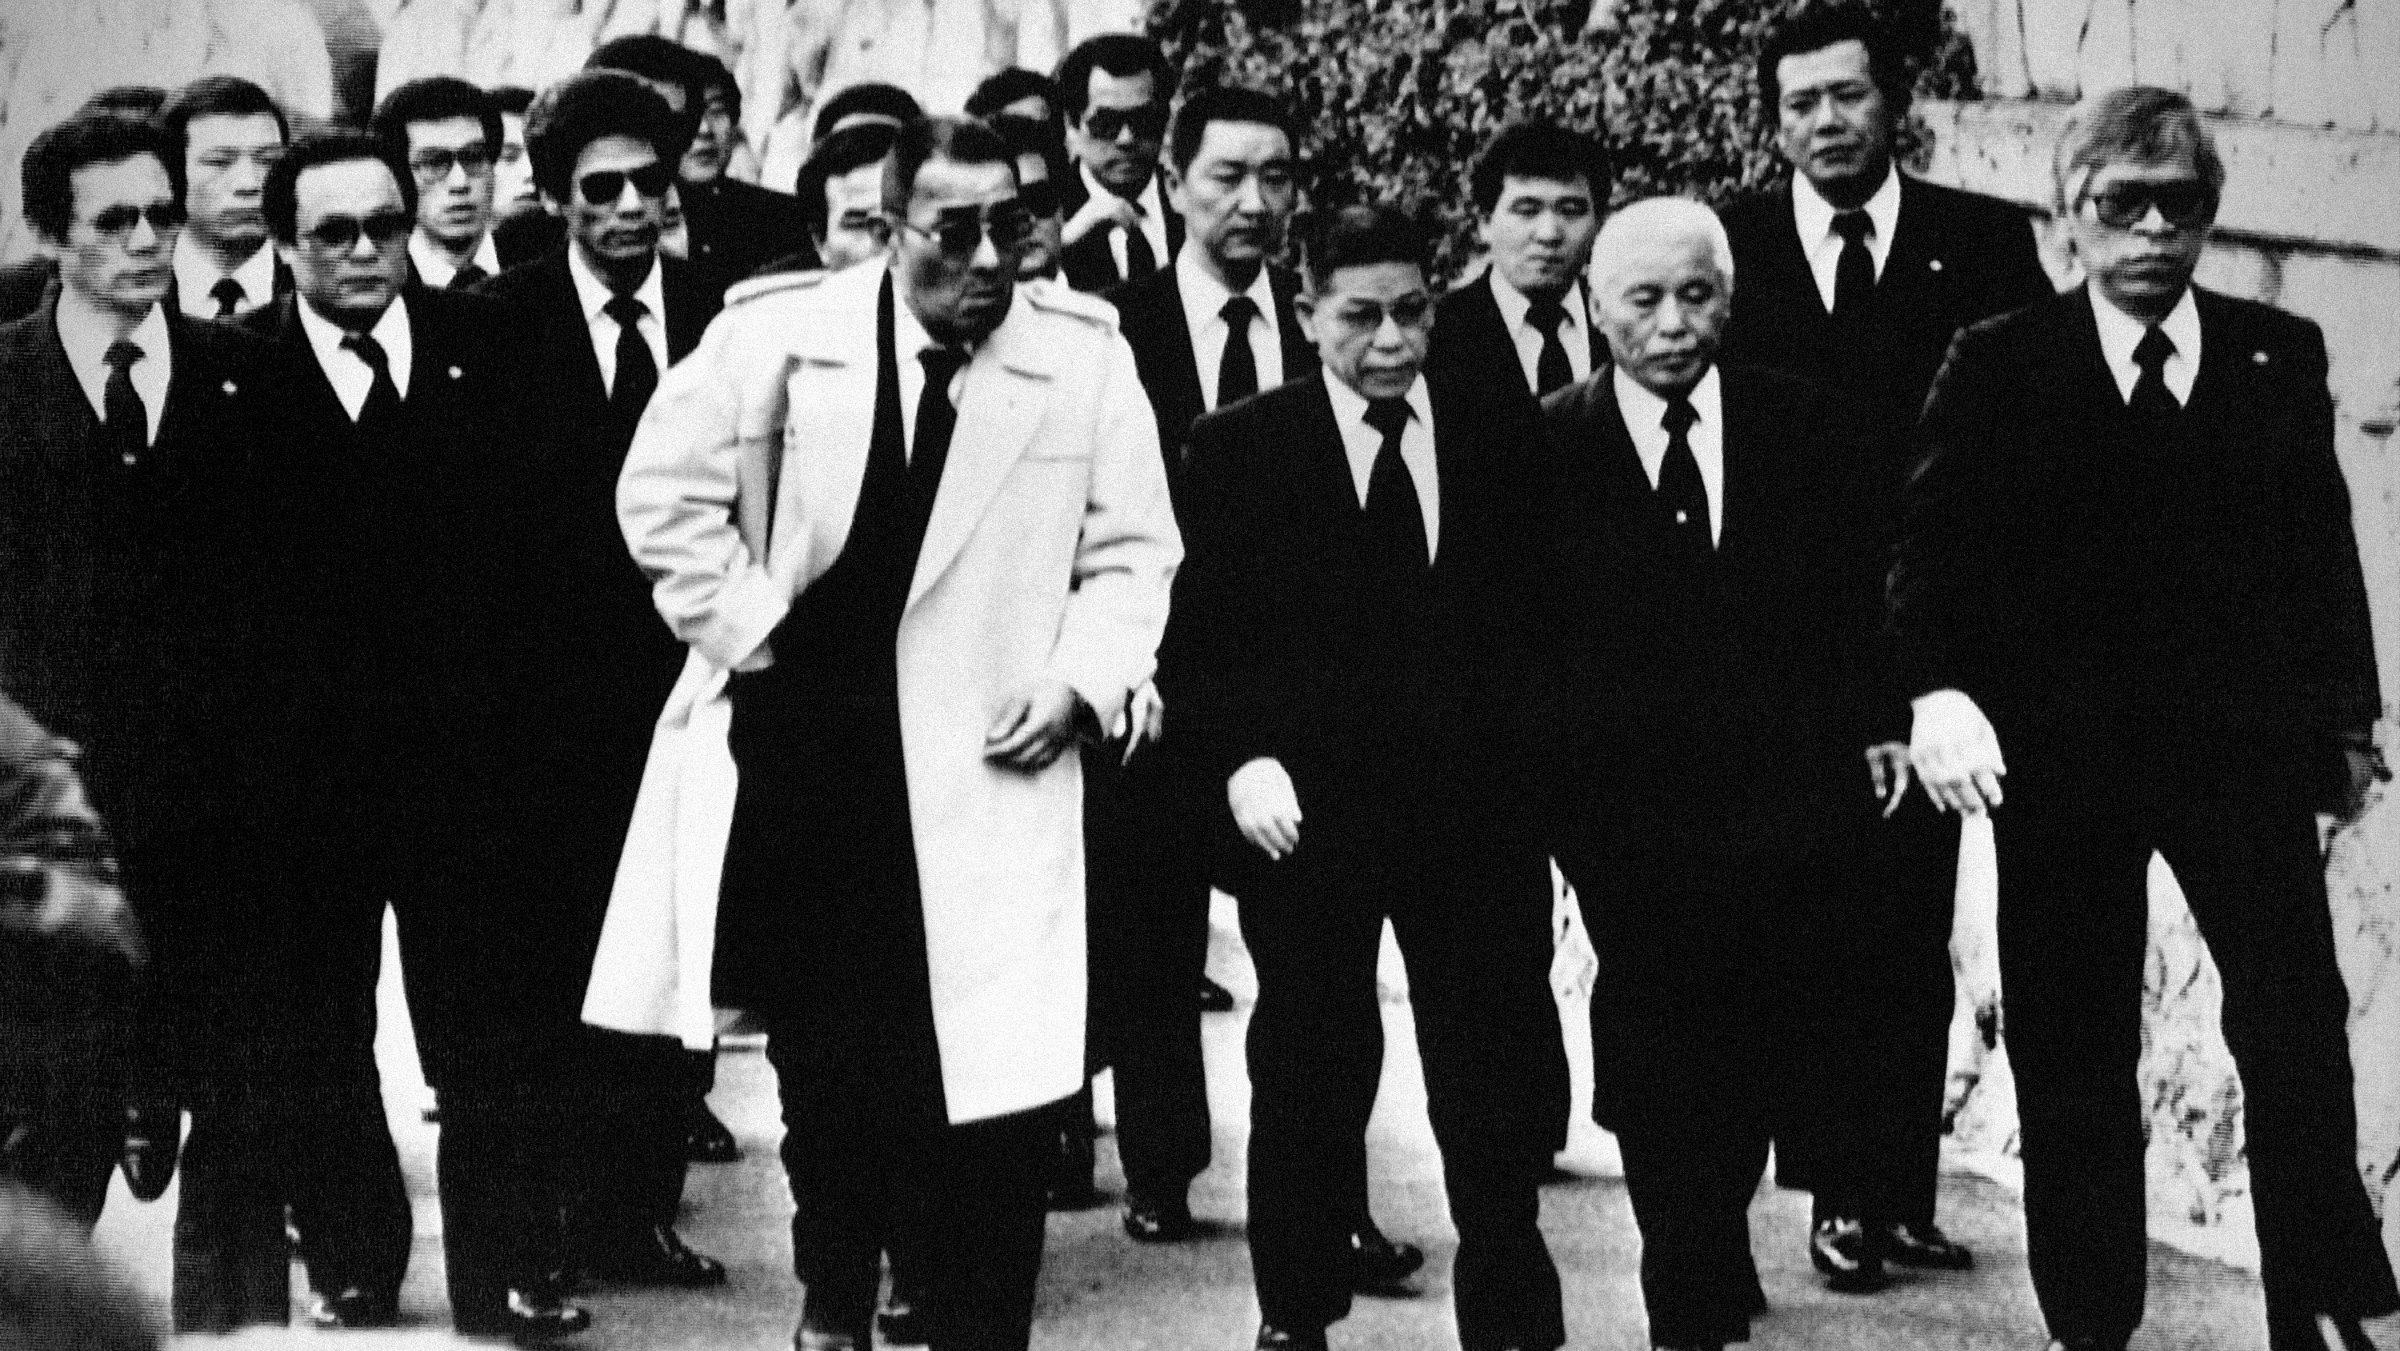 When the Yakuza come demanding money, you don't say no.